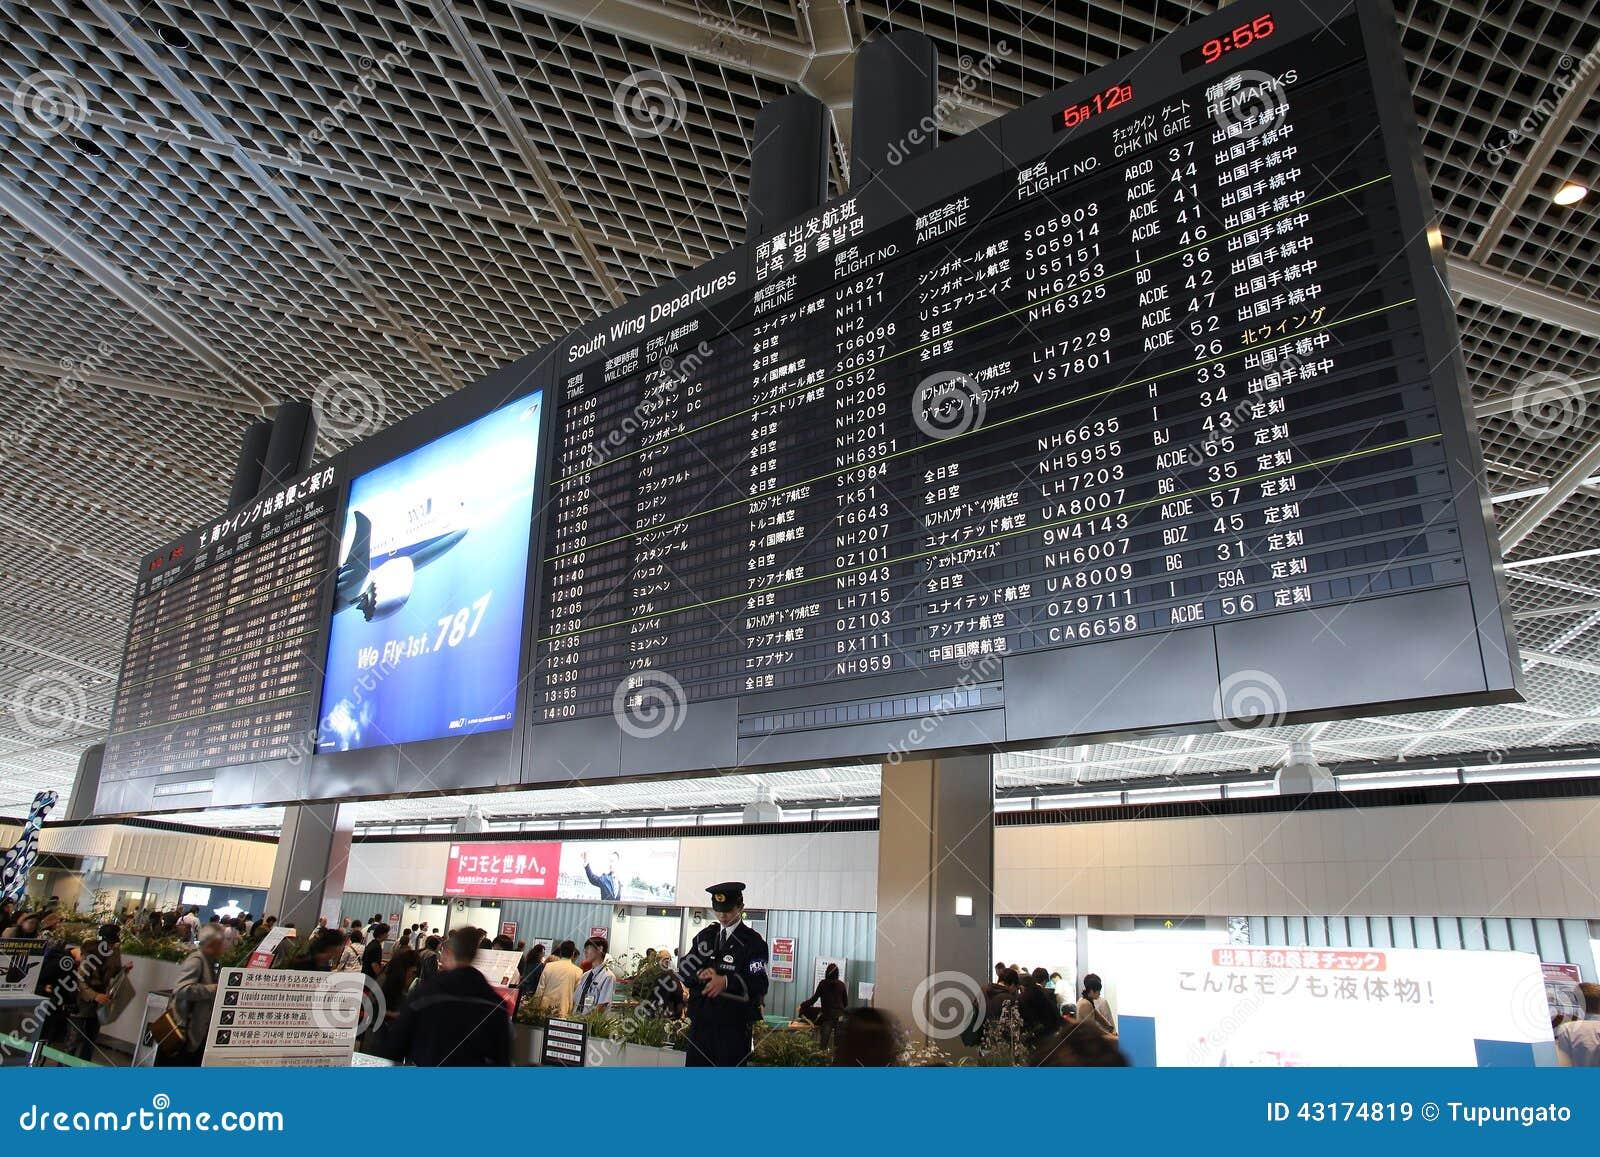 Aeroporto Tokyo : Tokyo narita airport editorial stock image image of schedule